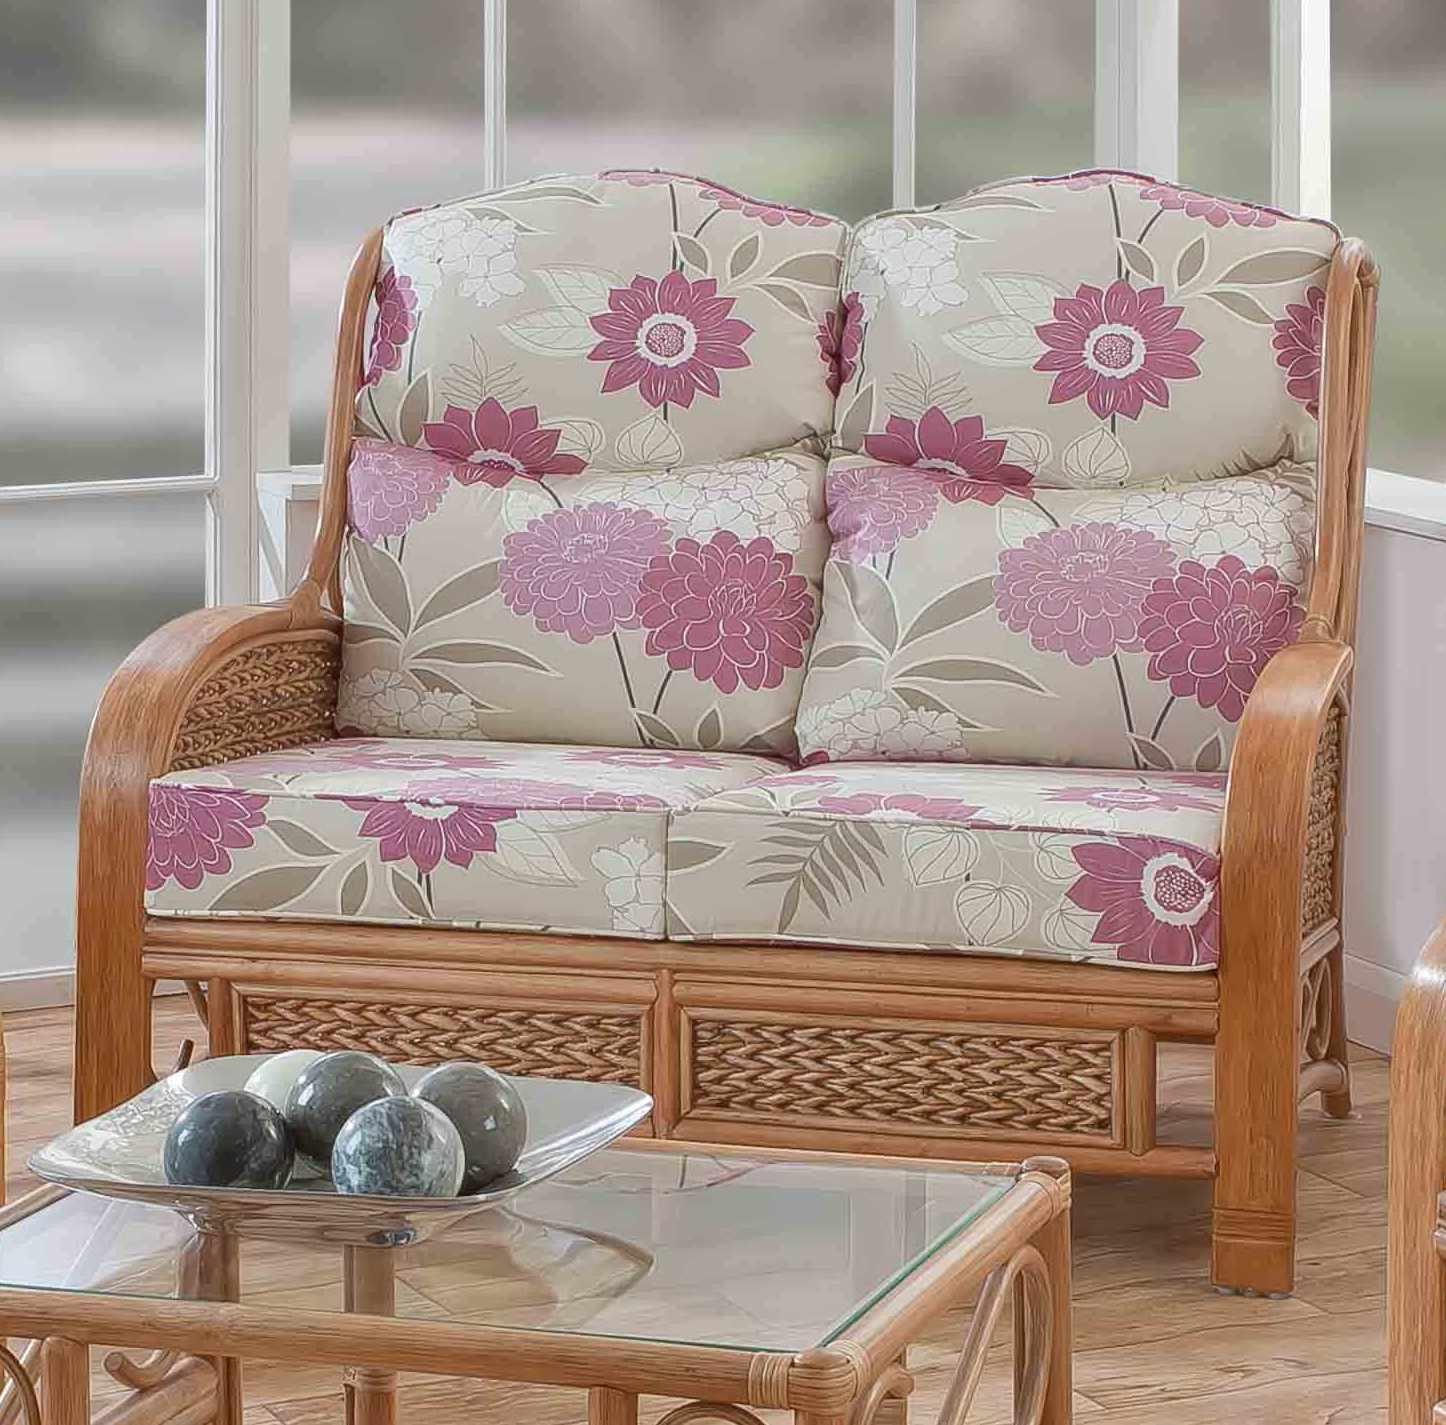 Upton 2 Seater Cane Sofa Natural